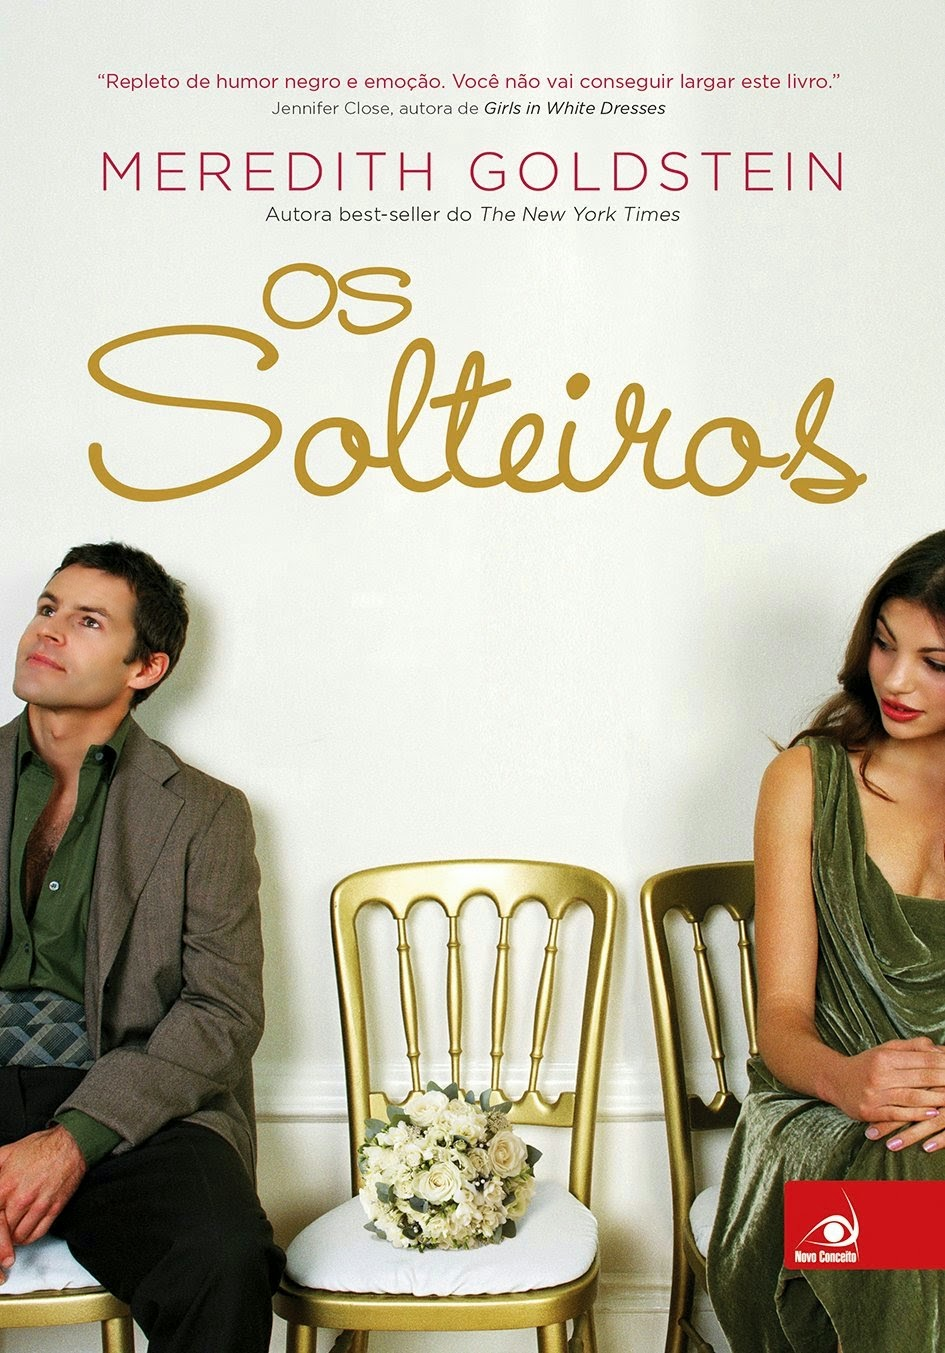 http://www.leituranossa.com.br/2014/04/os-solteiros-meredith-goldstein.html